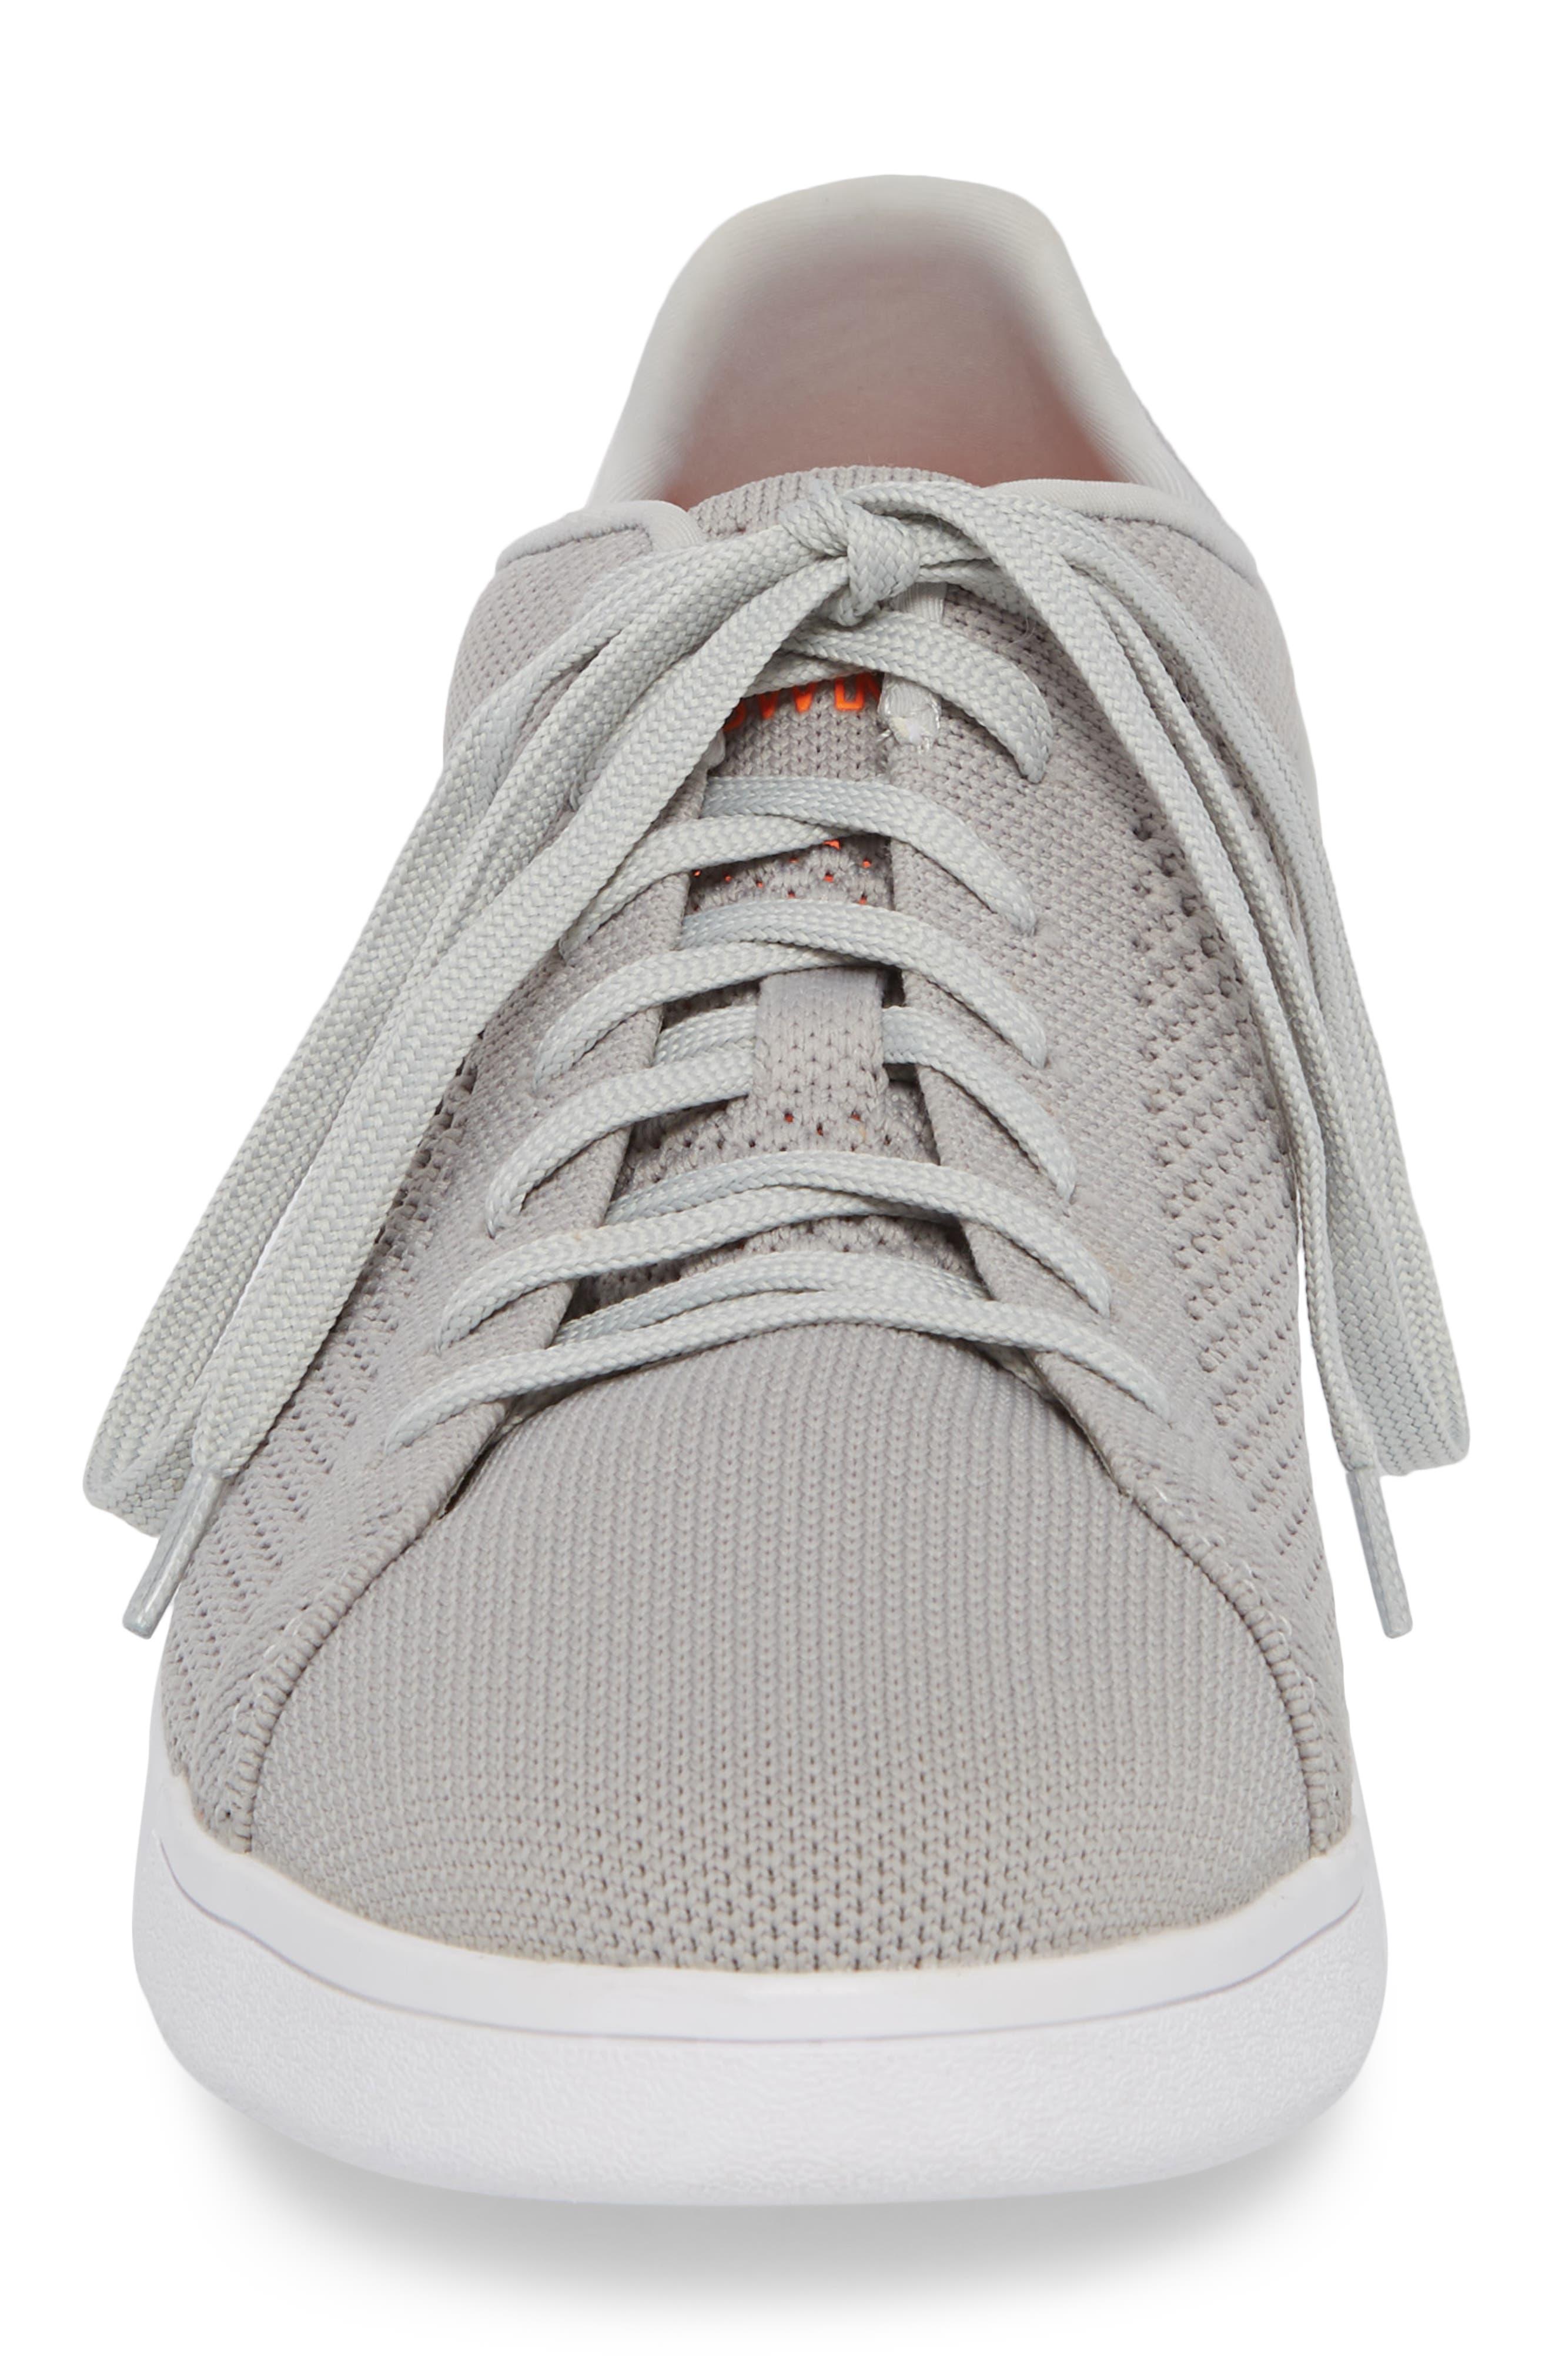 Alternate Image 4  - Swims Breeze Tennis Washable Knit Sneaker (Men)